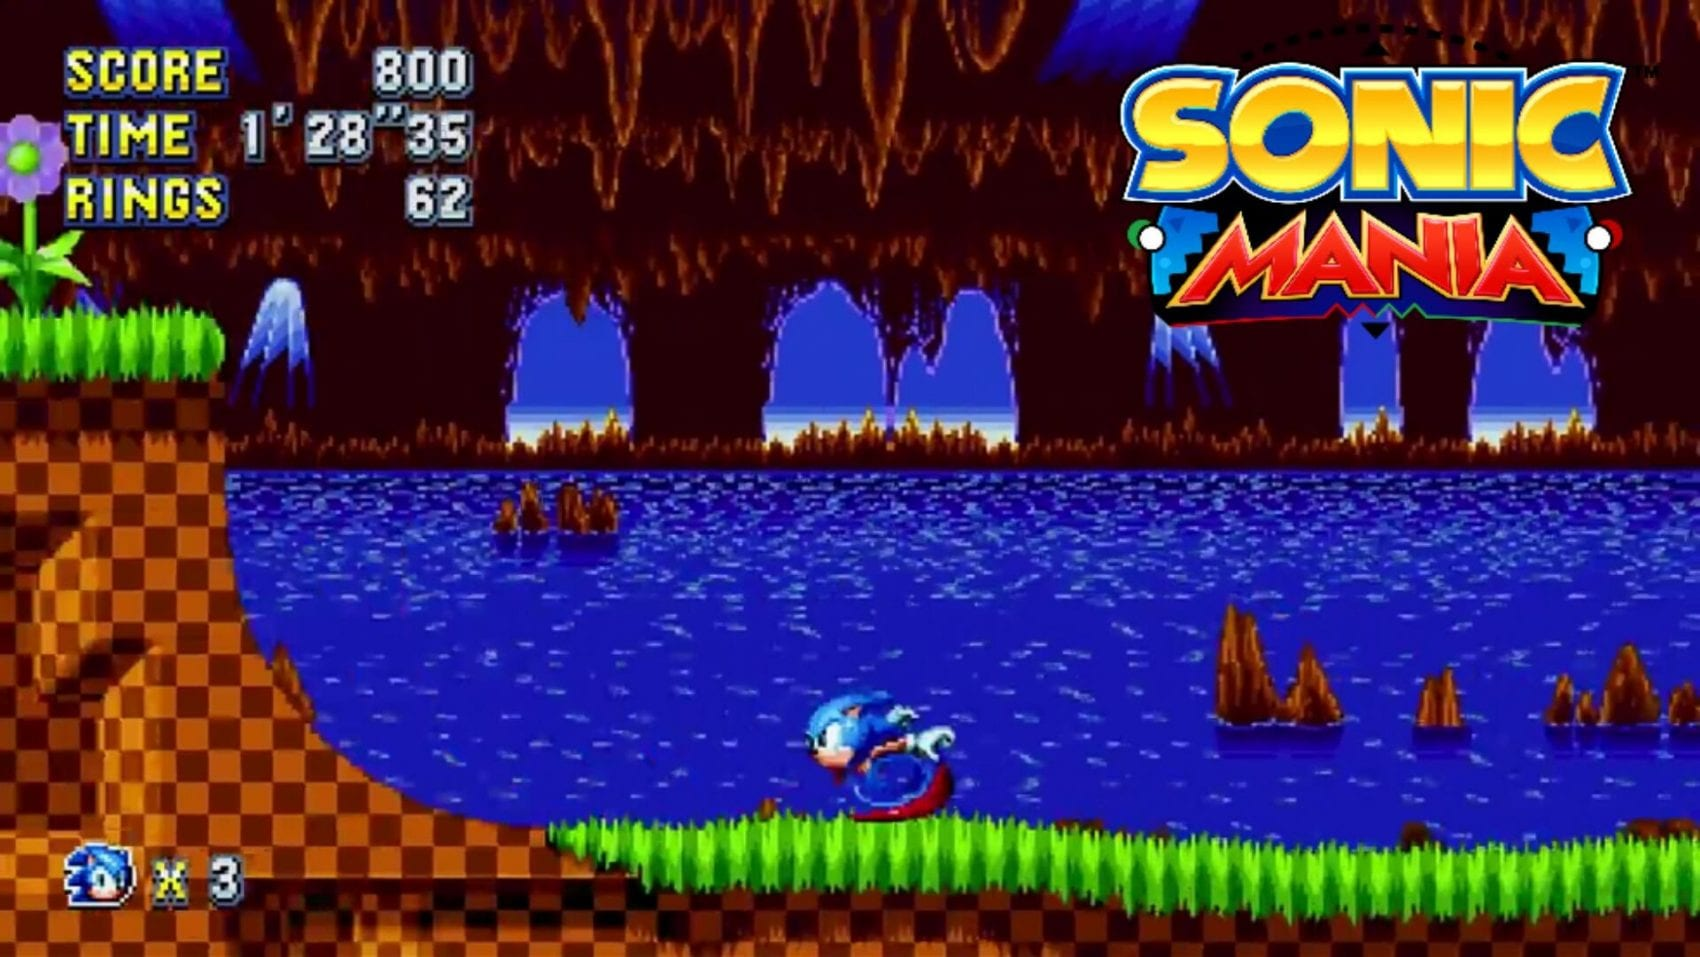 sonic-mania-nintendo-switch-news-my-geek-actu-gameplay